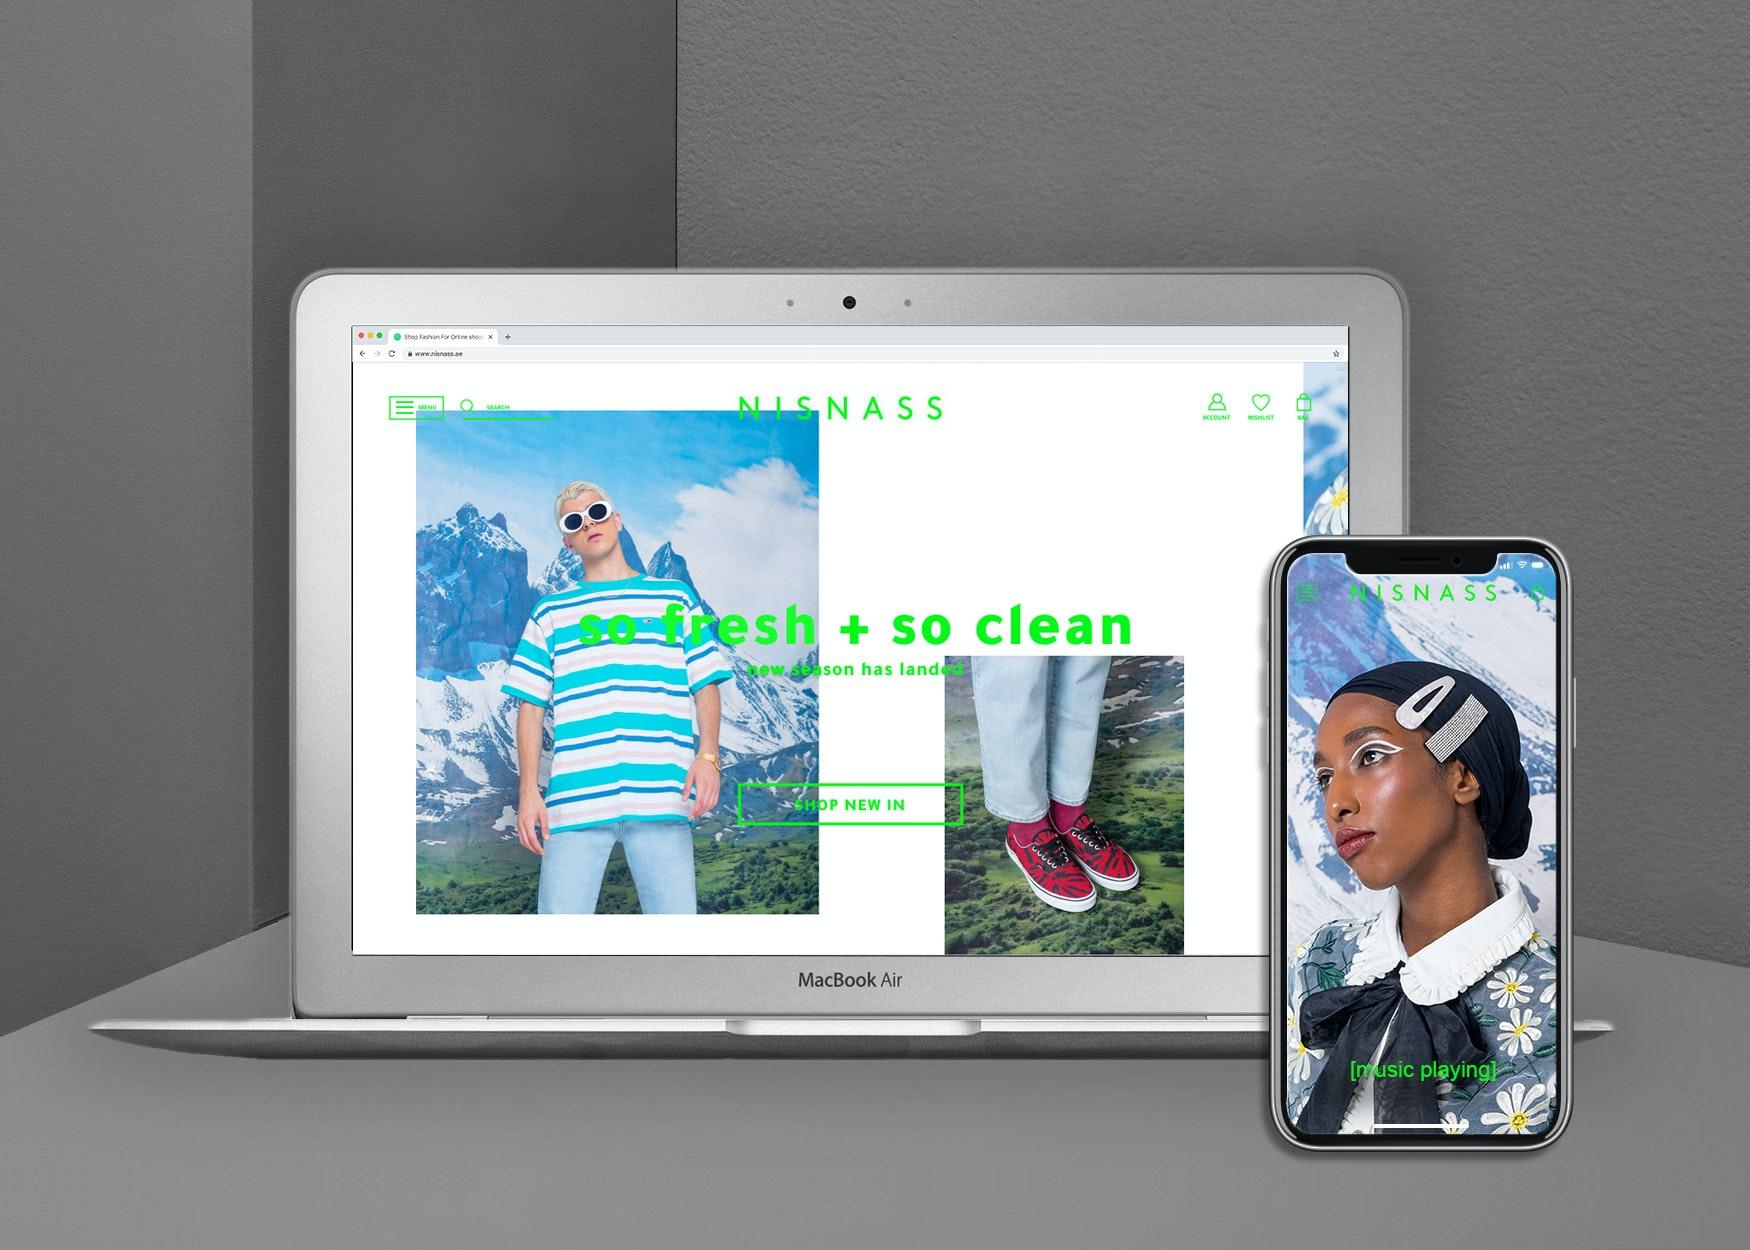 NISNASS_So_Fresh_So_Clean_Sophie_Gerritsen